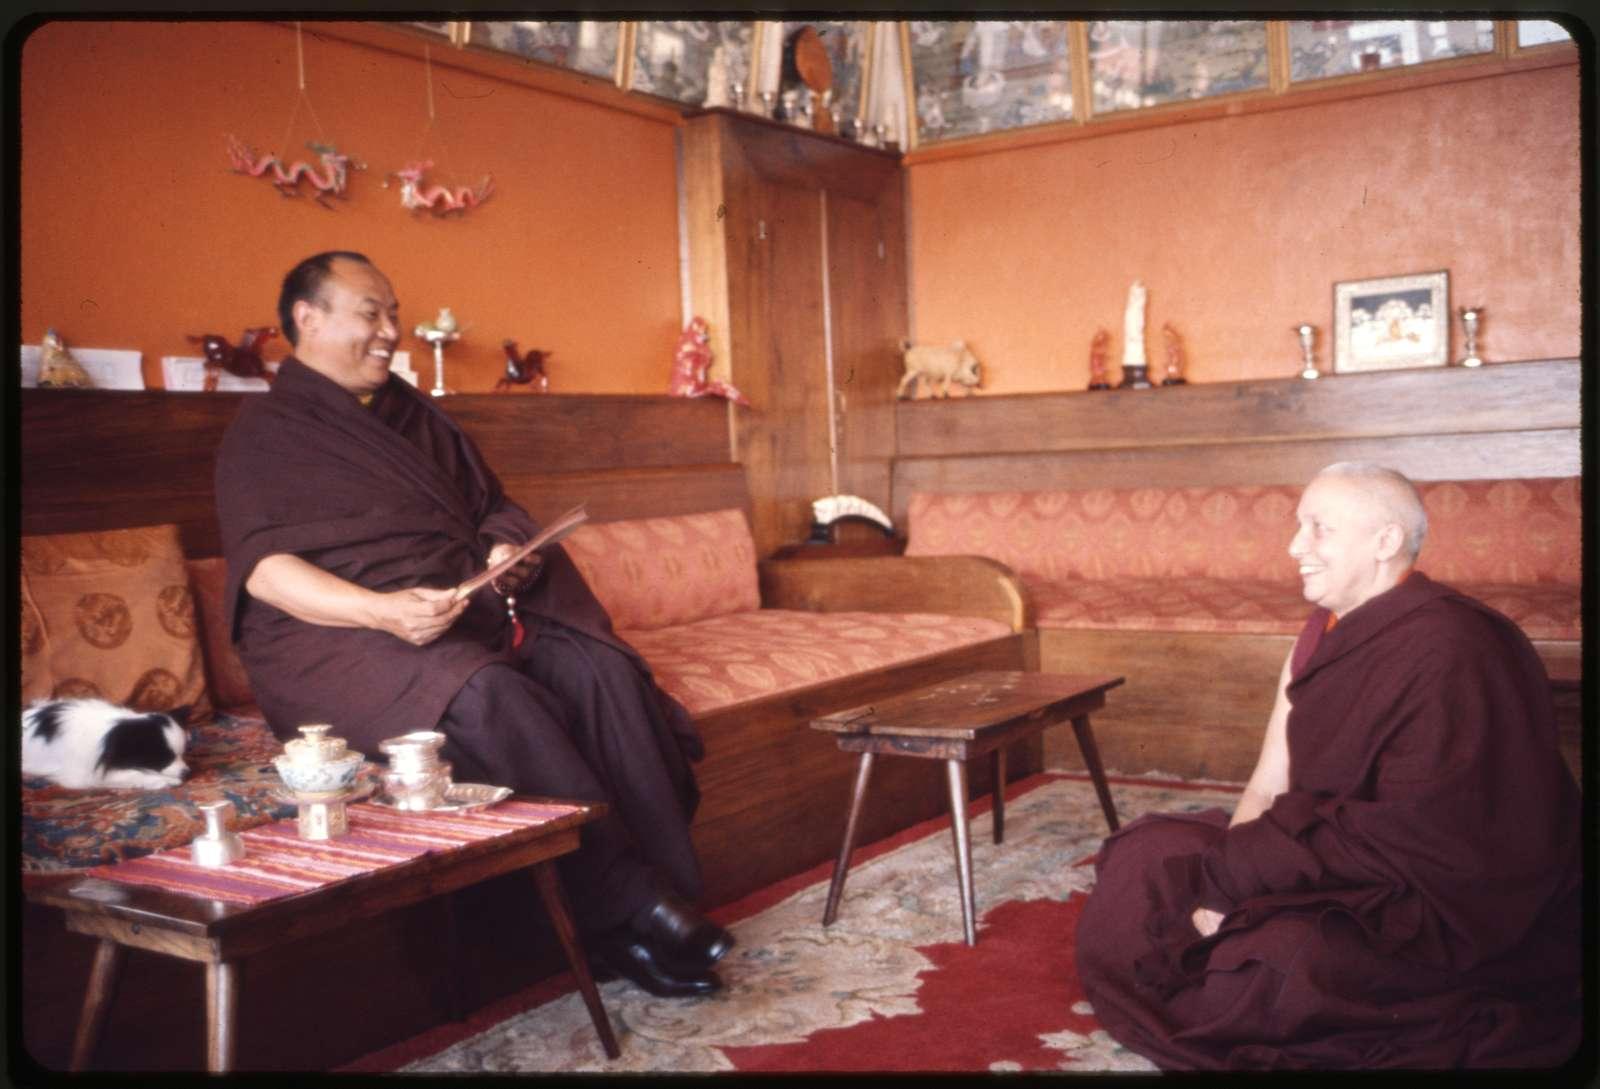 [Rangjung Rigpe Dorje, the 16th Karmapa Lama, seated, with a monk, at Rumtek Monastery, Sikkim]